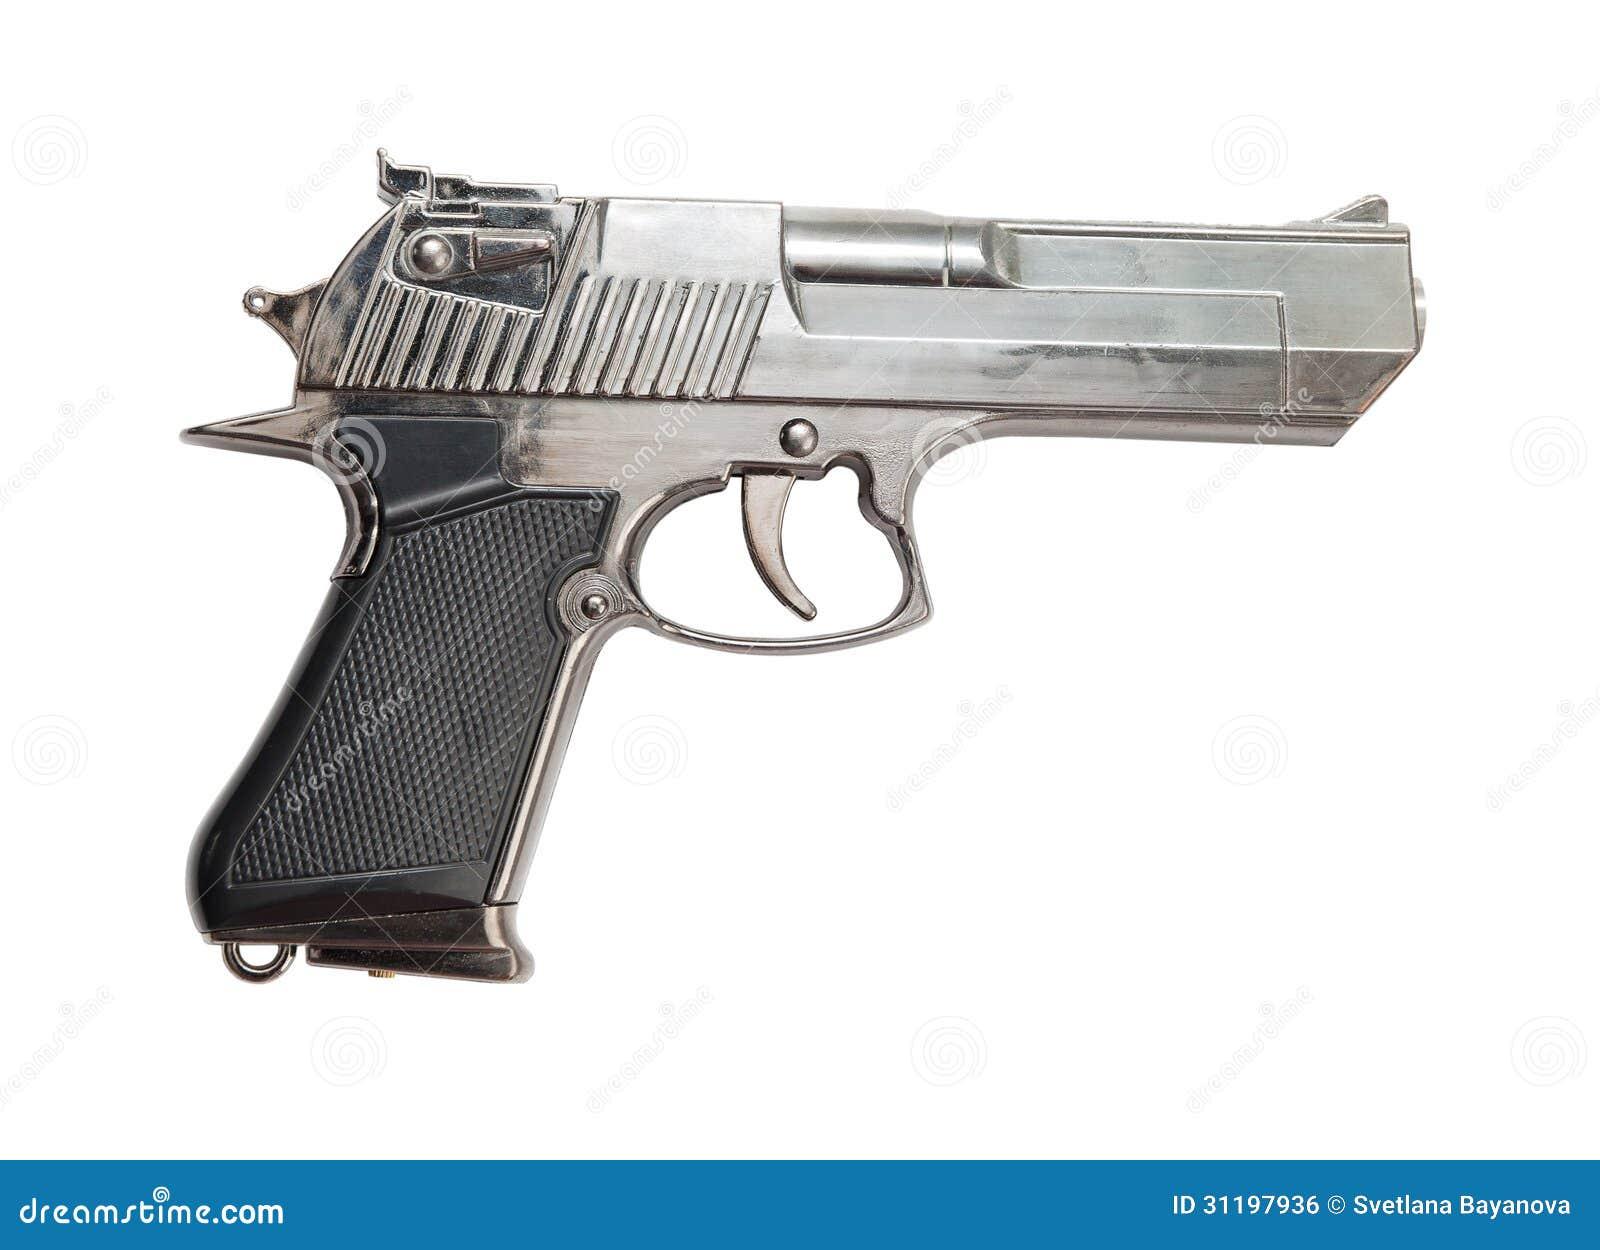 gun white background - photo #13